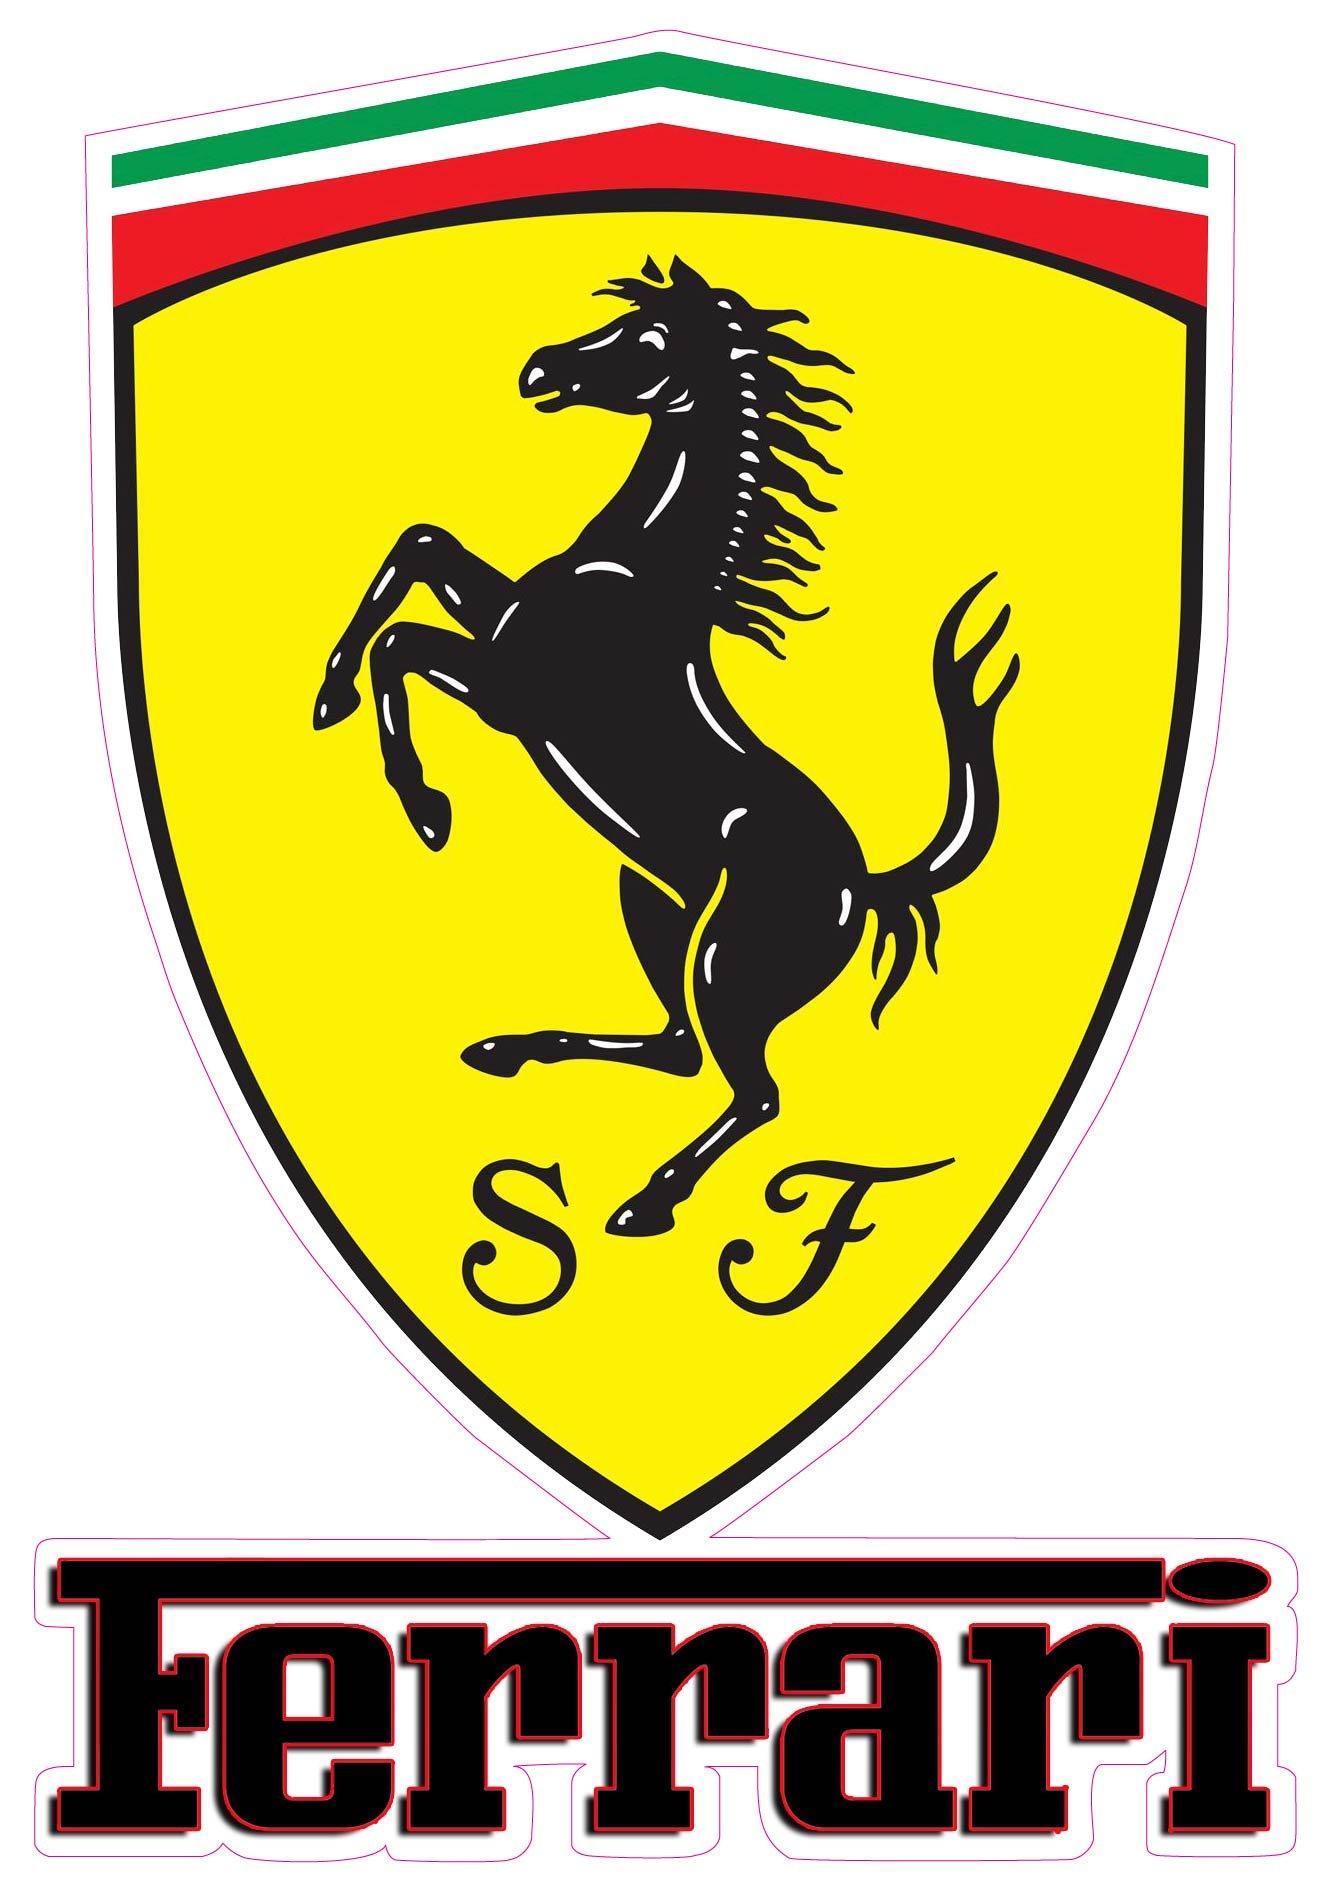 2Pcs Car Sticker Rear Side Emblem Badge Auto Accessories For Ferrari 488 ff 458